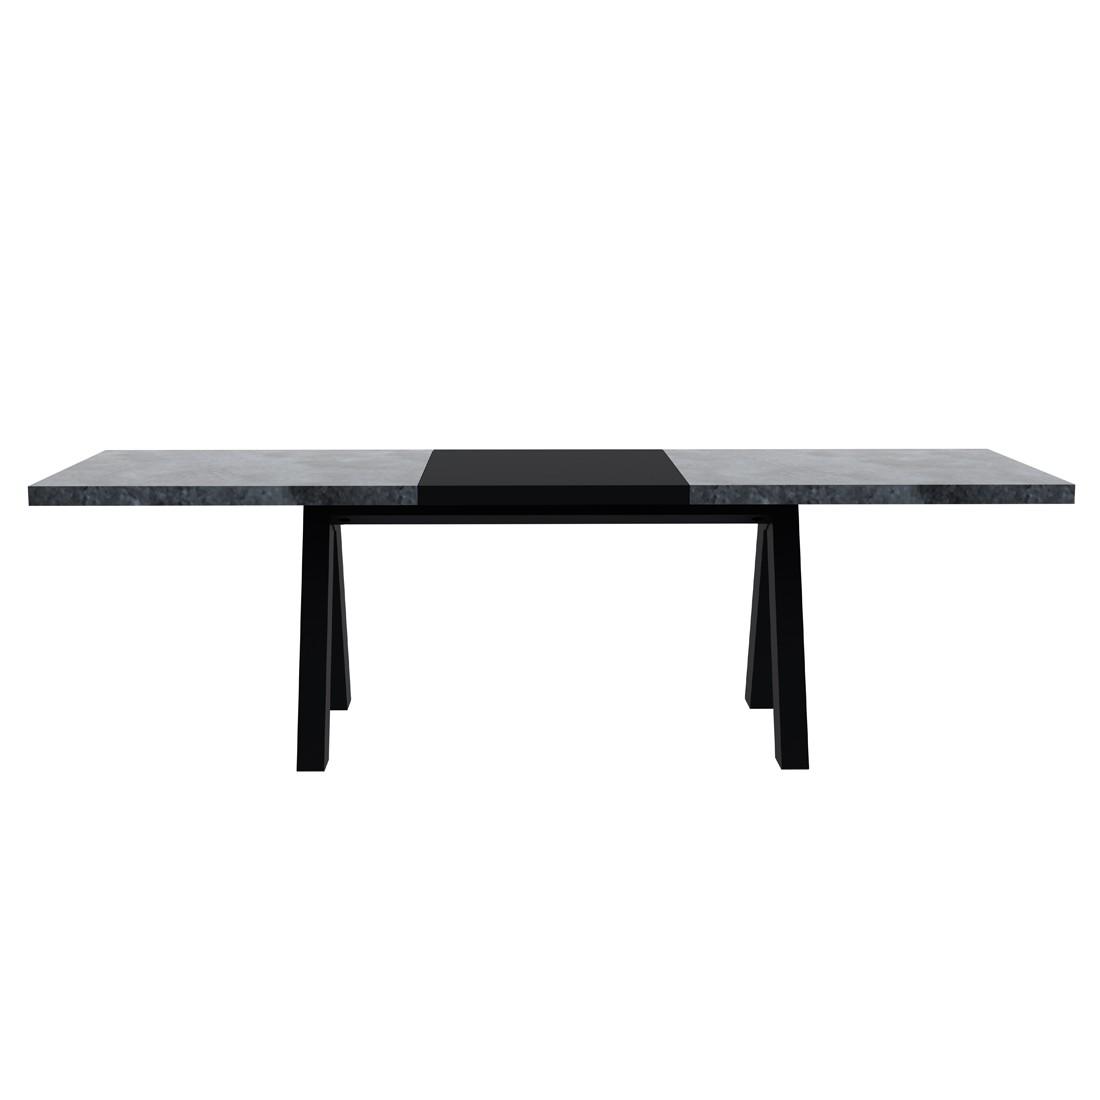 Table à manger Thornton (avec rallonge) - Imitation béton / noir, temahome